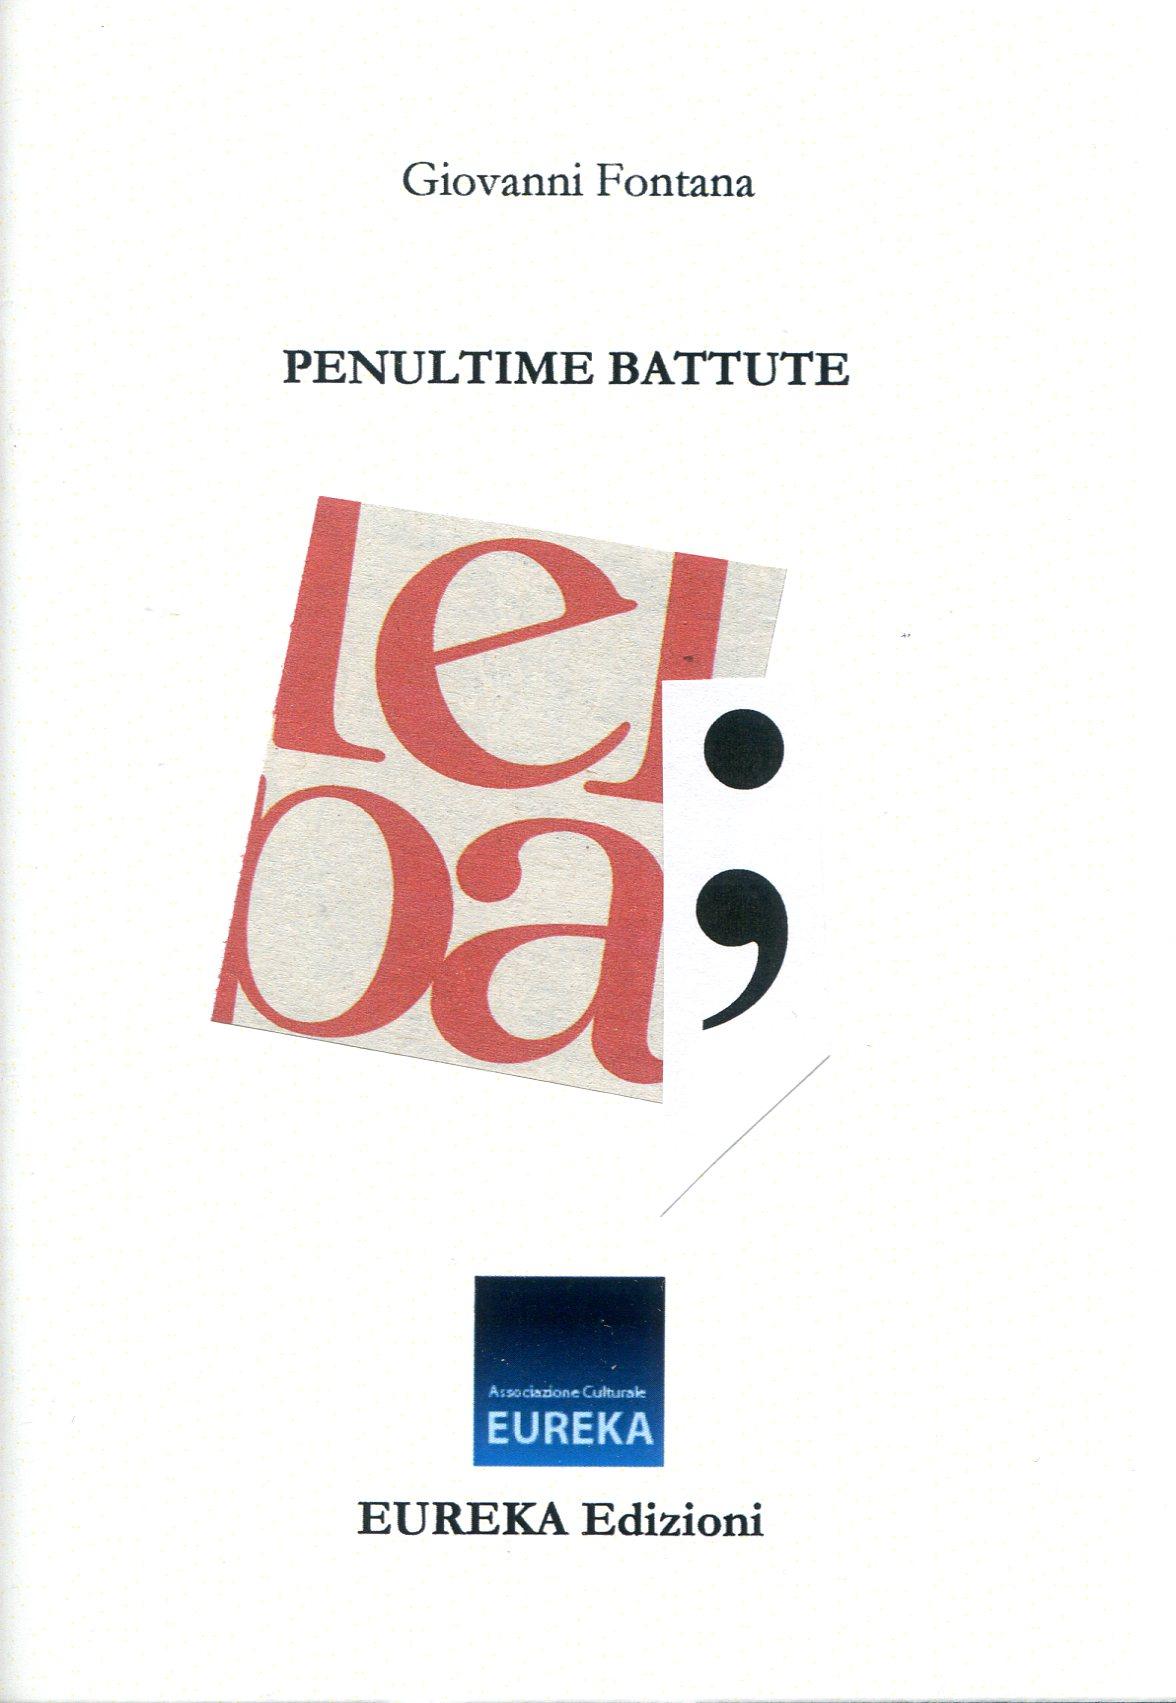 Giovanni Fontana - Penultime battute